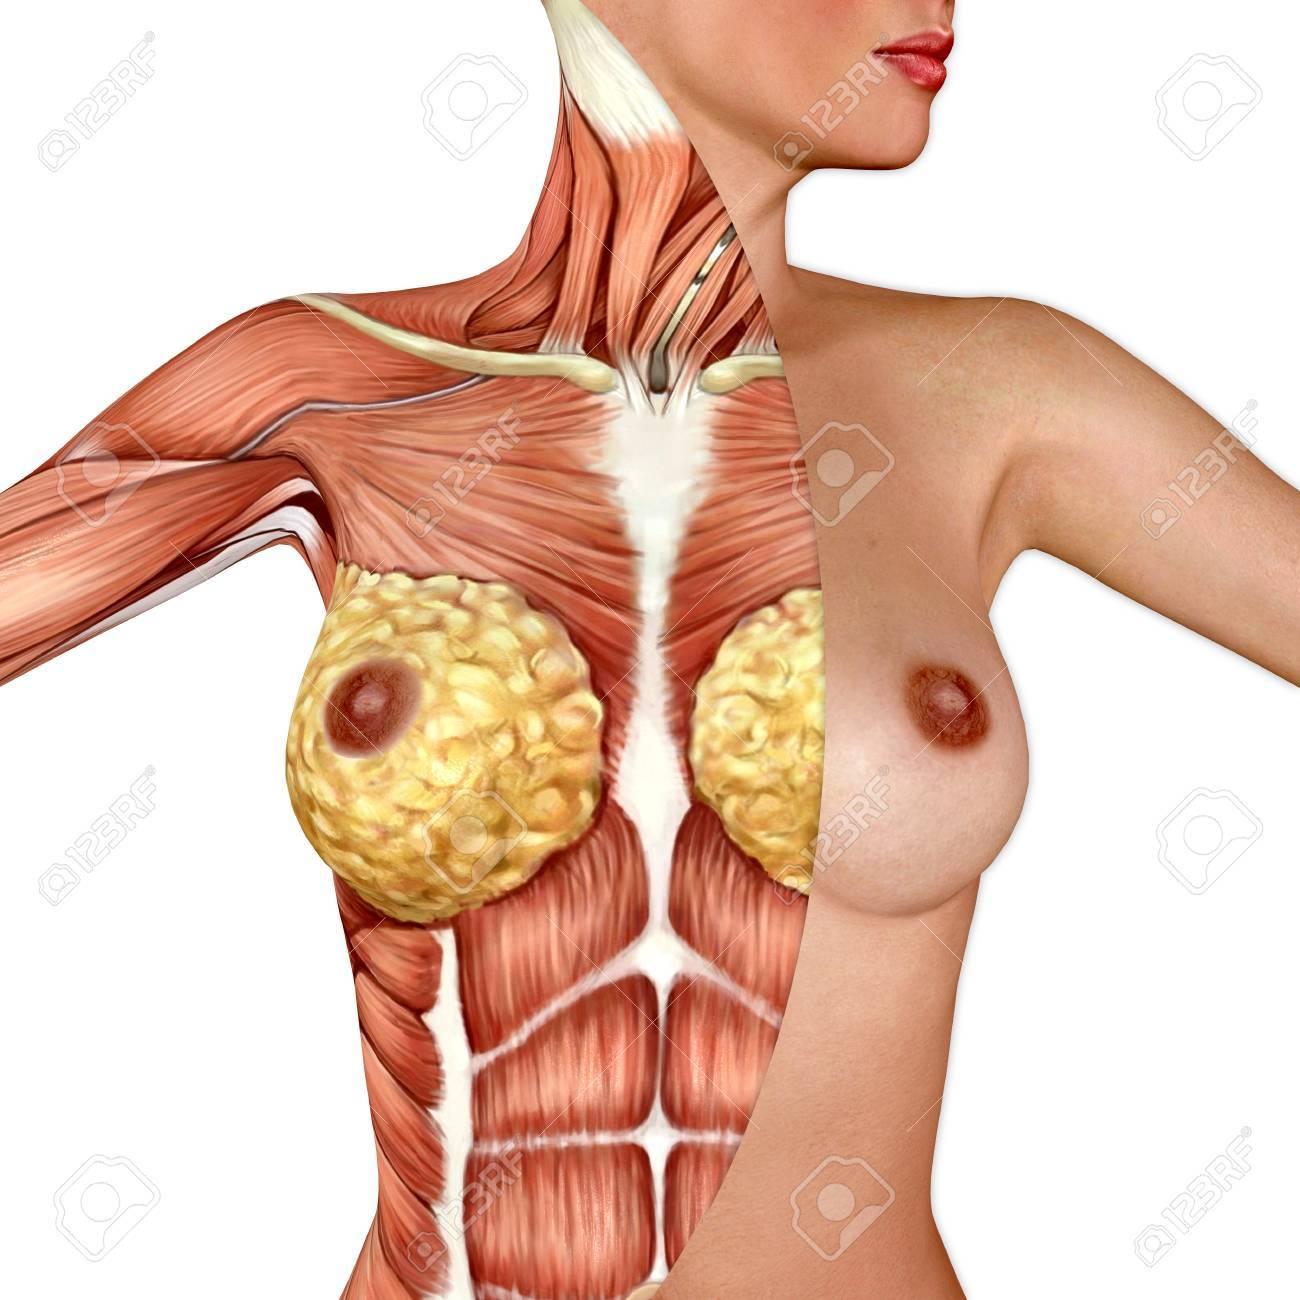 Female breast pics